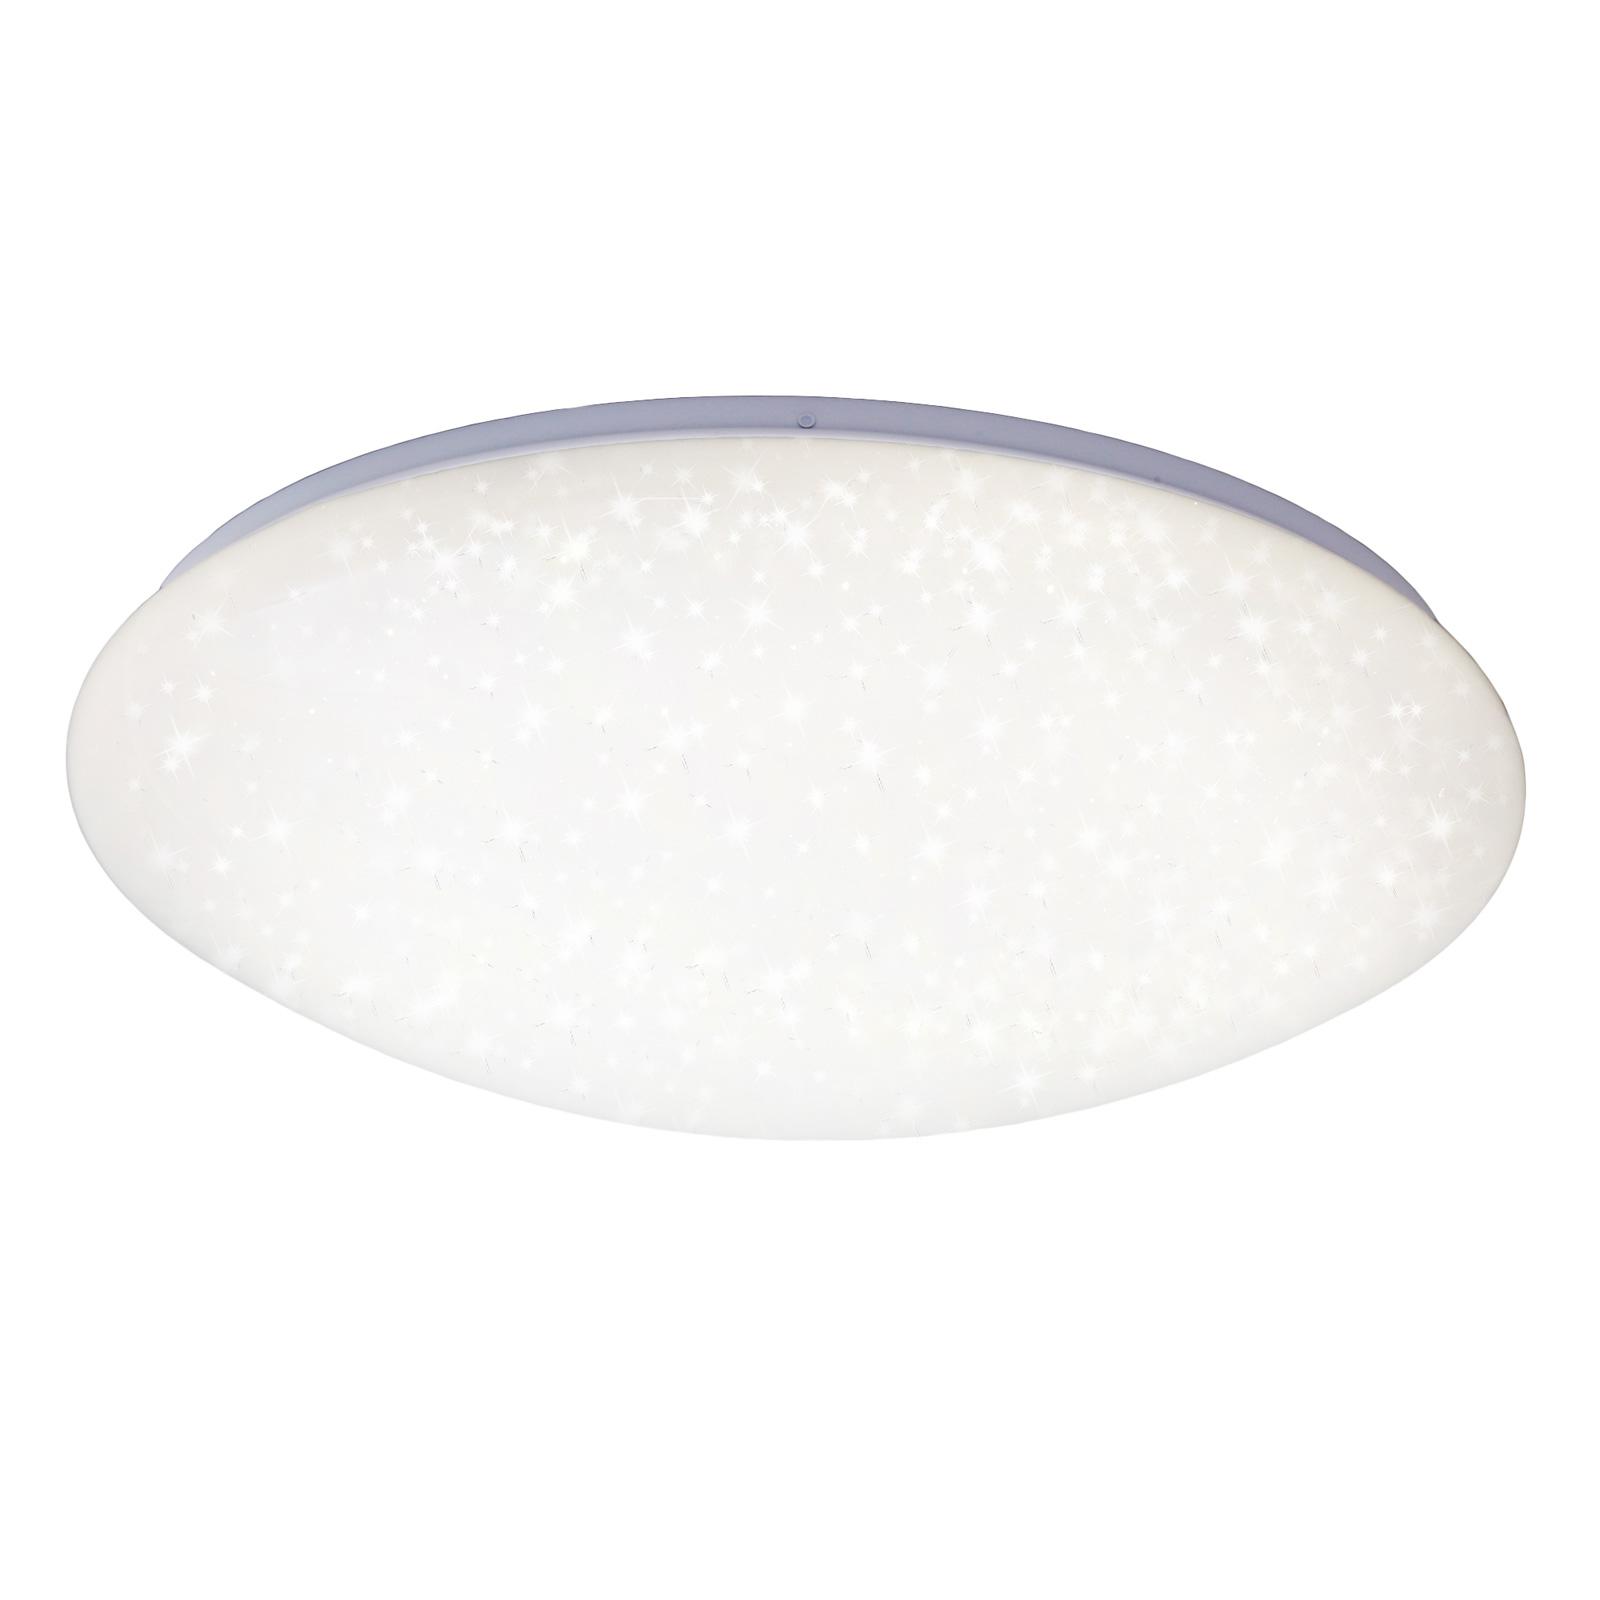 LED plafondlamp 3226-016 sterrenhemel-effect 49cm